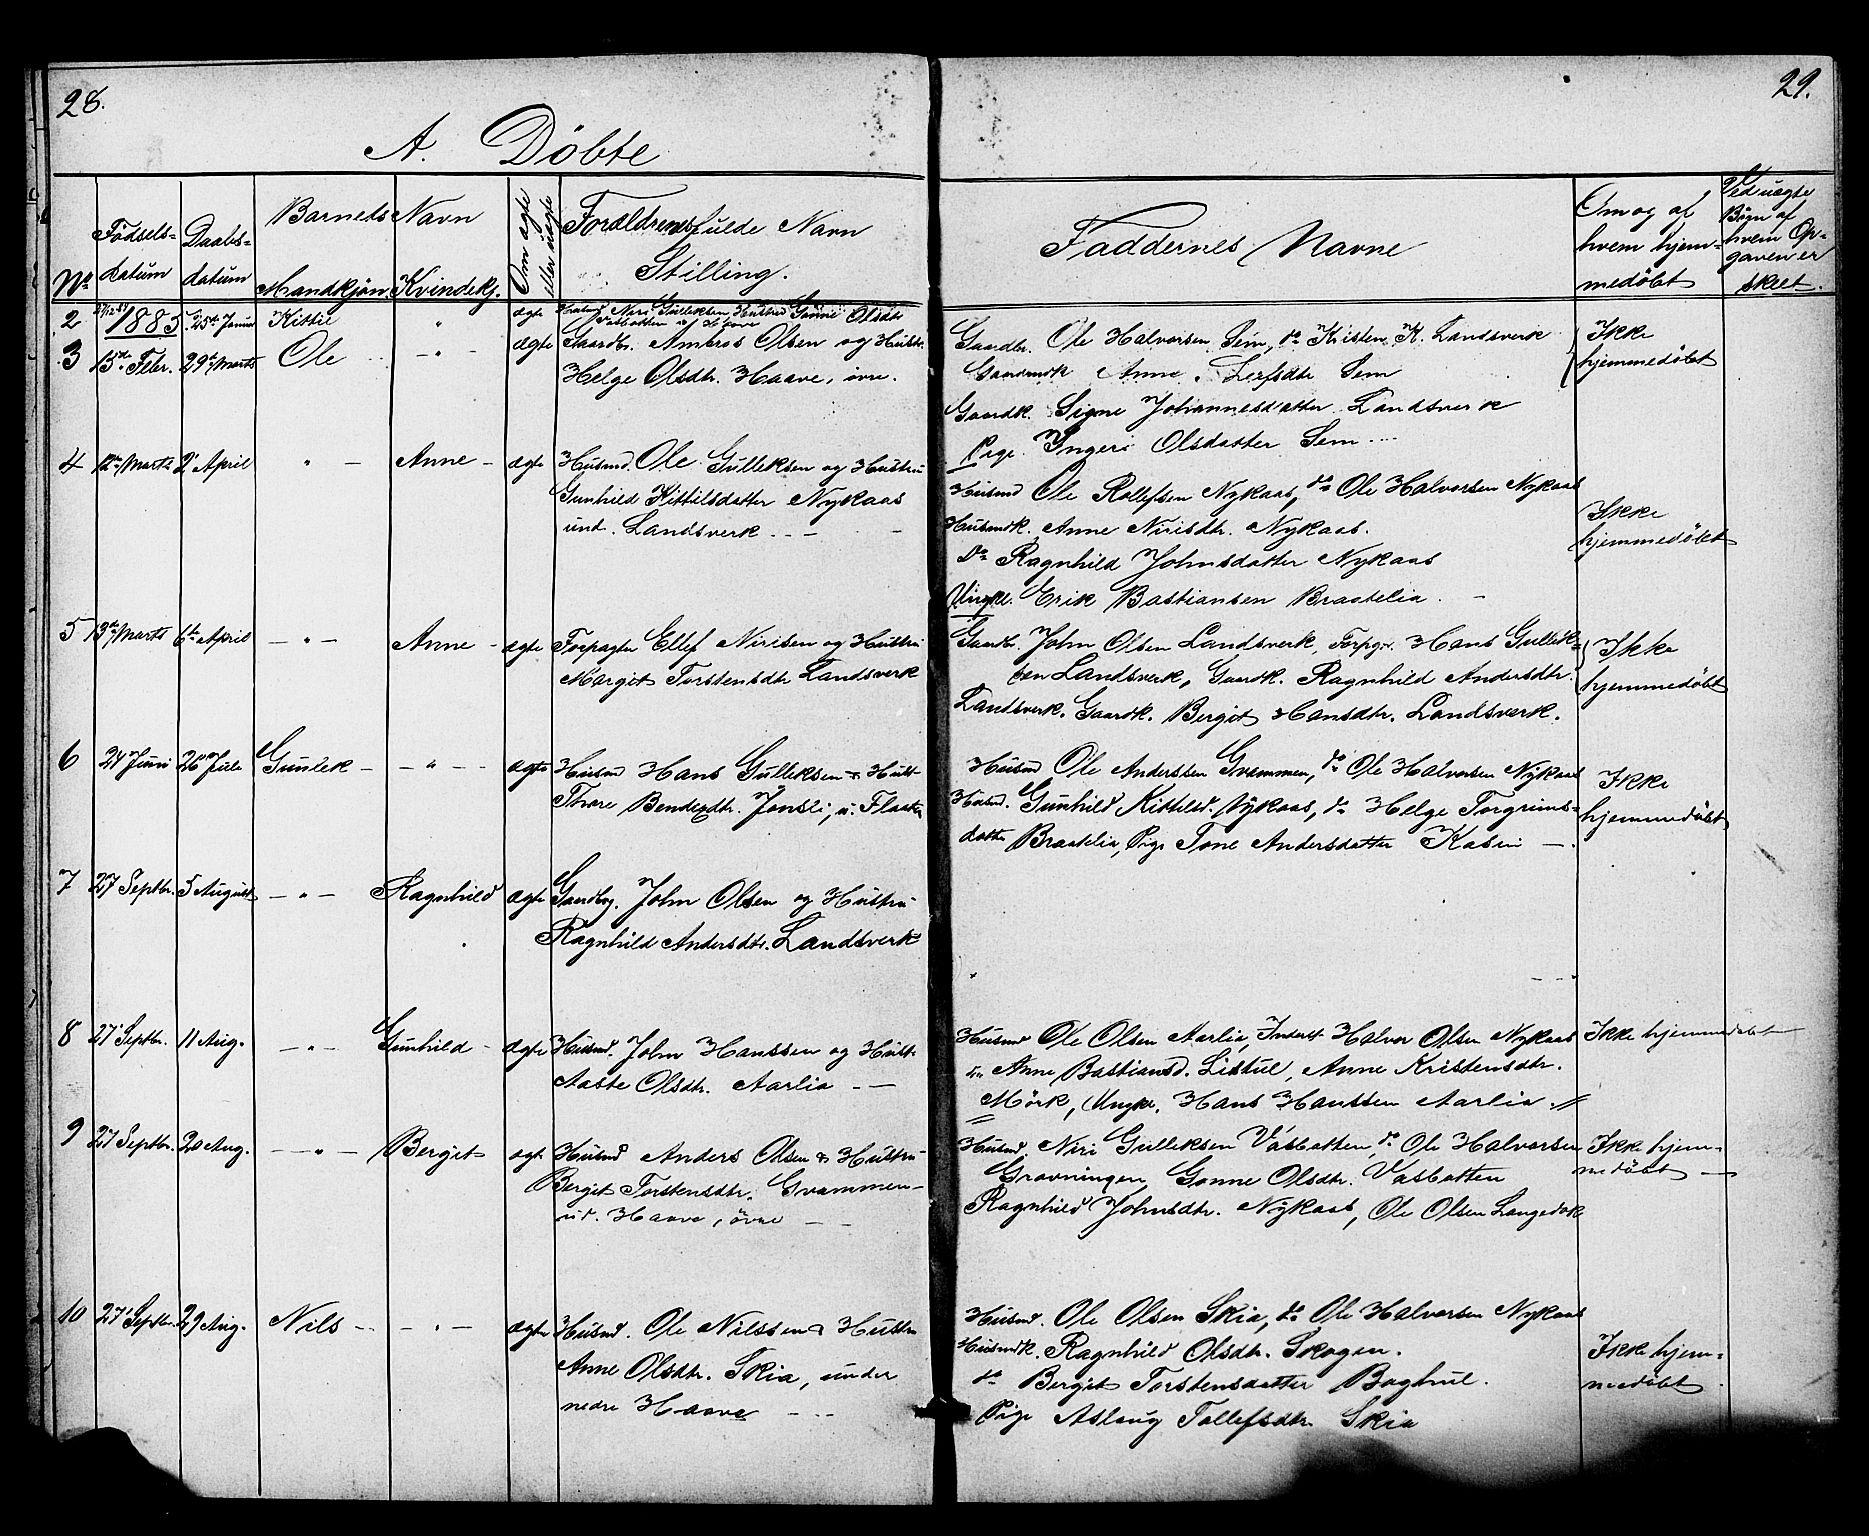 SAKO, Heddal kirkebøker, G/Gb/L0001: Klokkerbok nr. II 1, 1866-1887, s. 28-29